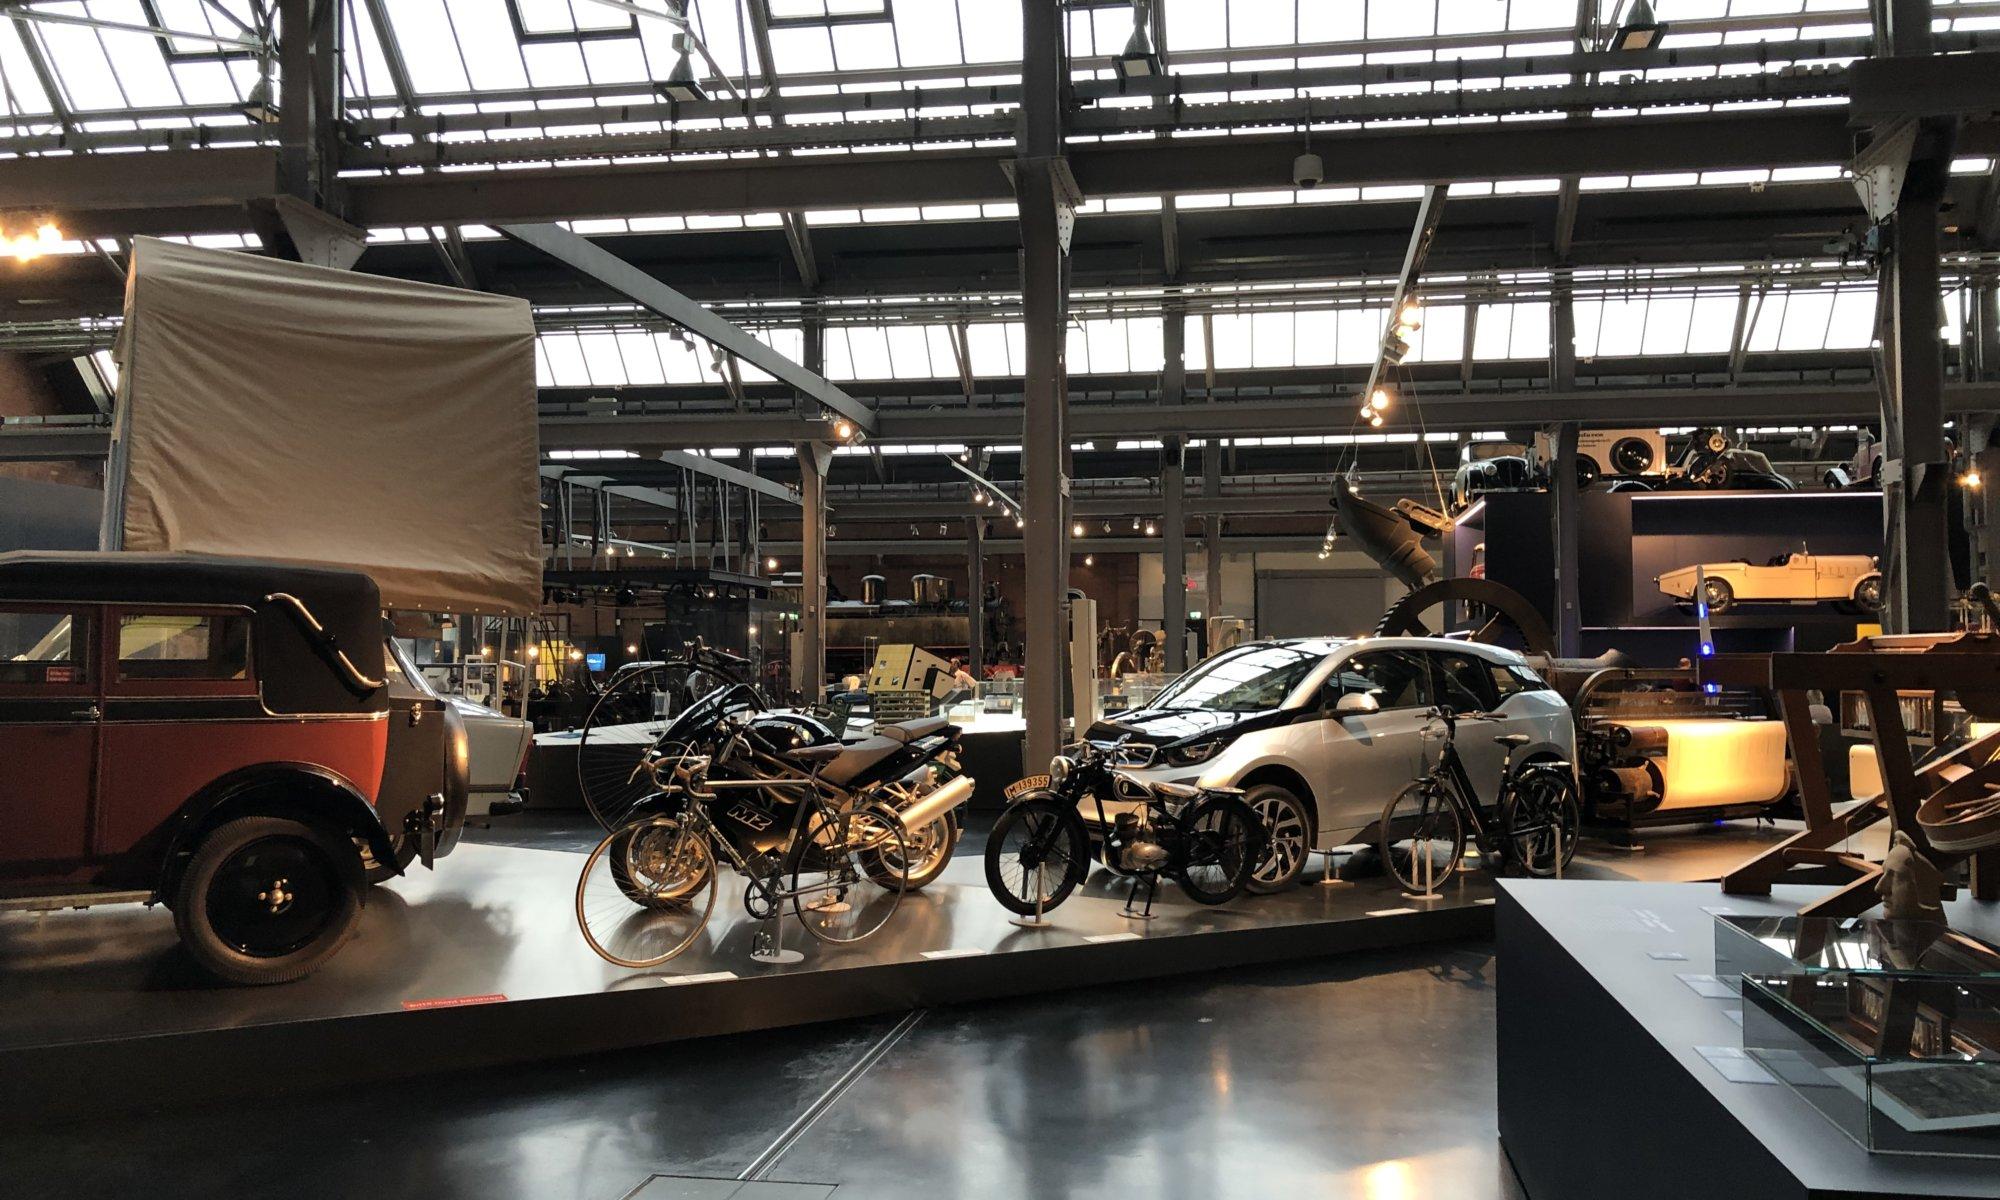 Industriemuseum, Chemnitz